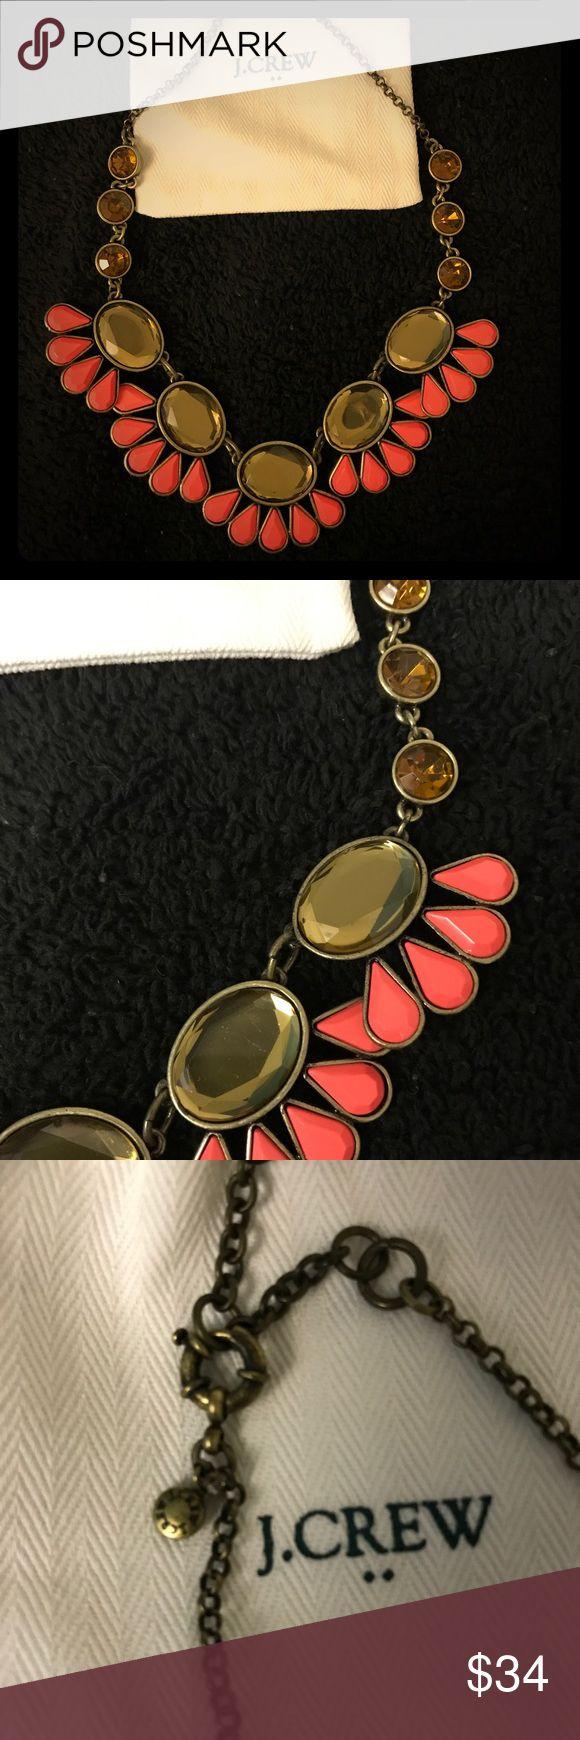 J. Crew coral statement necklace J. Crew coral petal statement necklace J. Crew Jewelry Necklaces